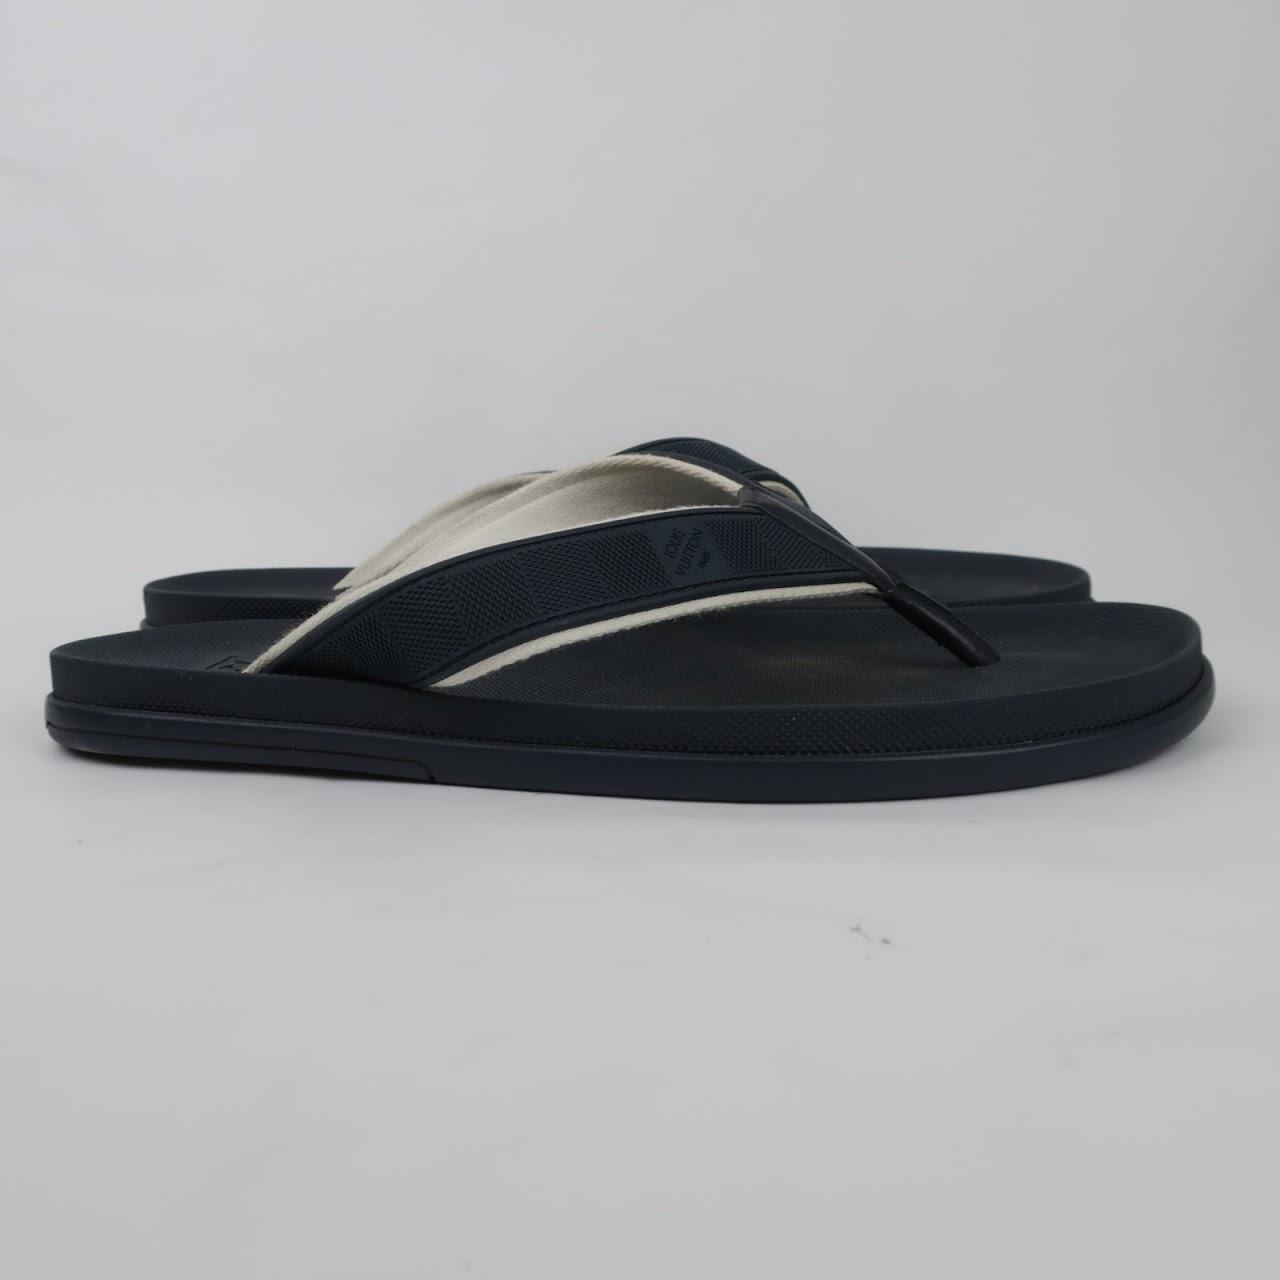 Louis Vuitton Flip Flops